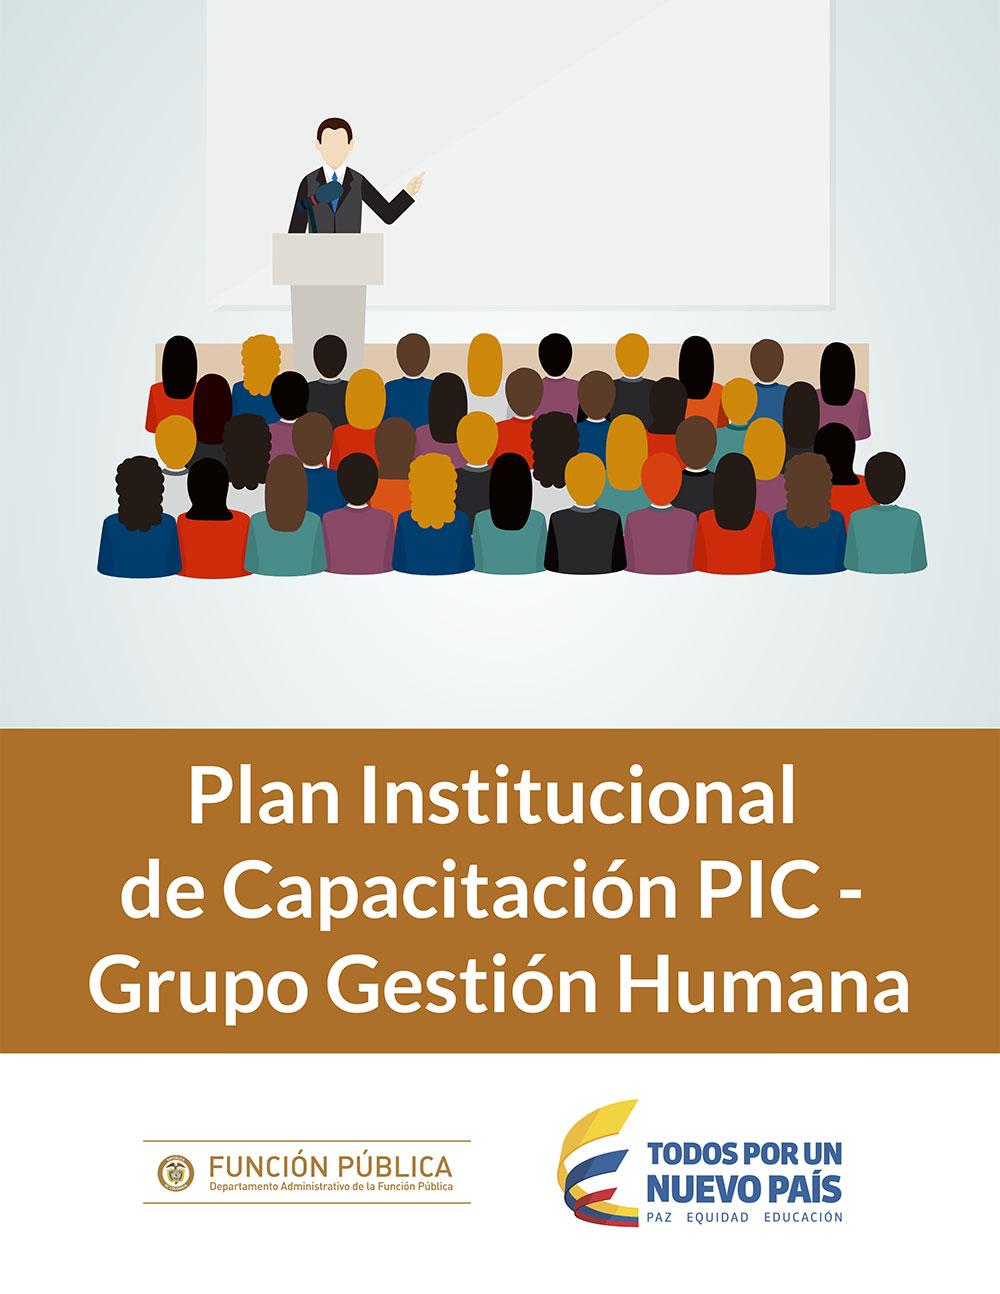 Plan institucional de Capacitación  -PIC-